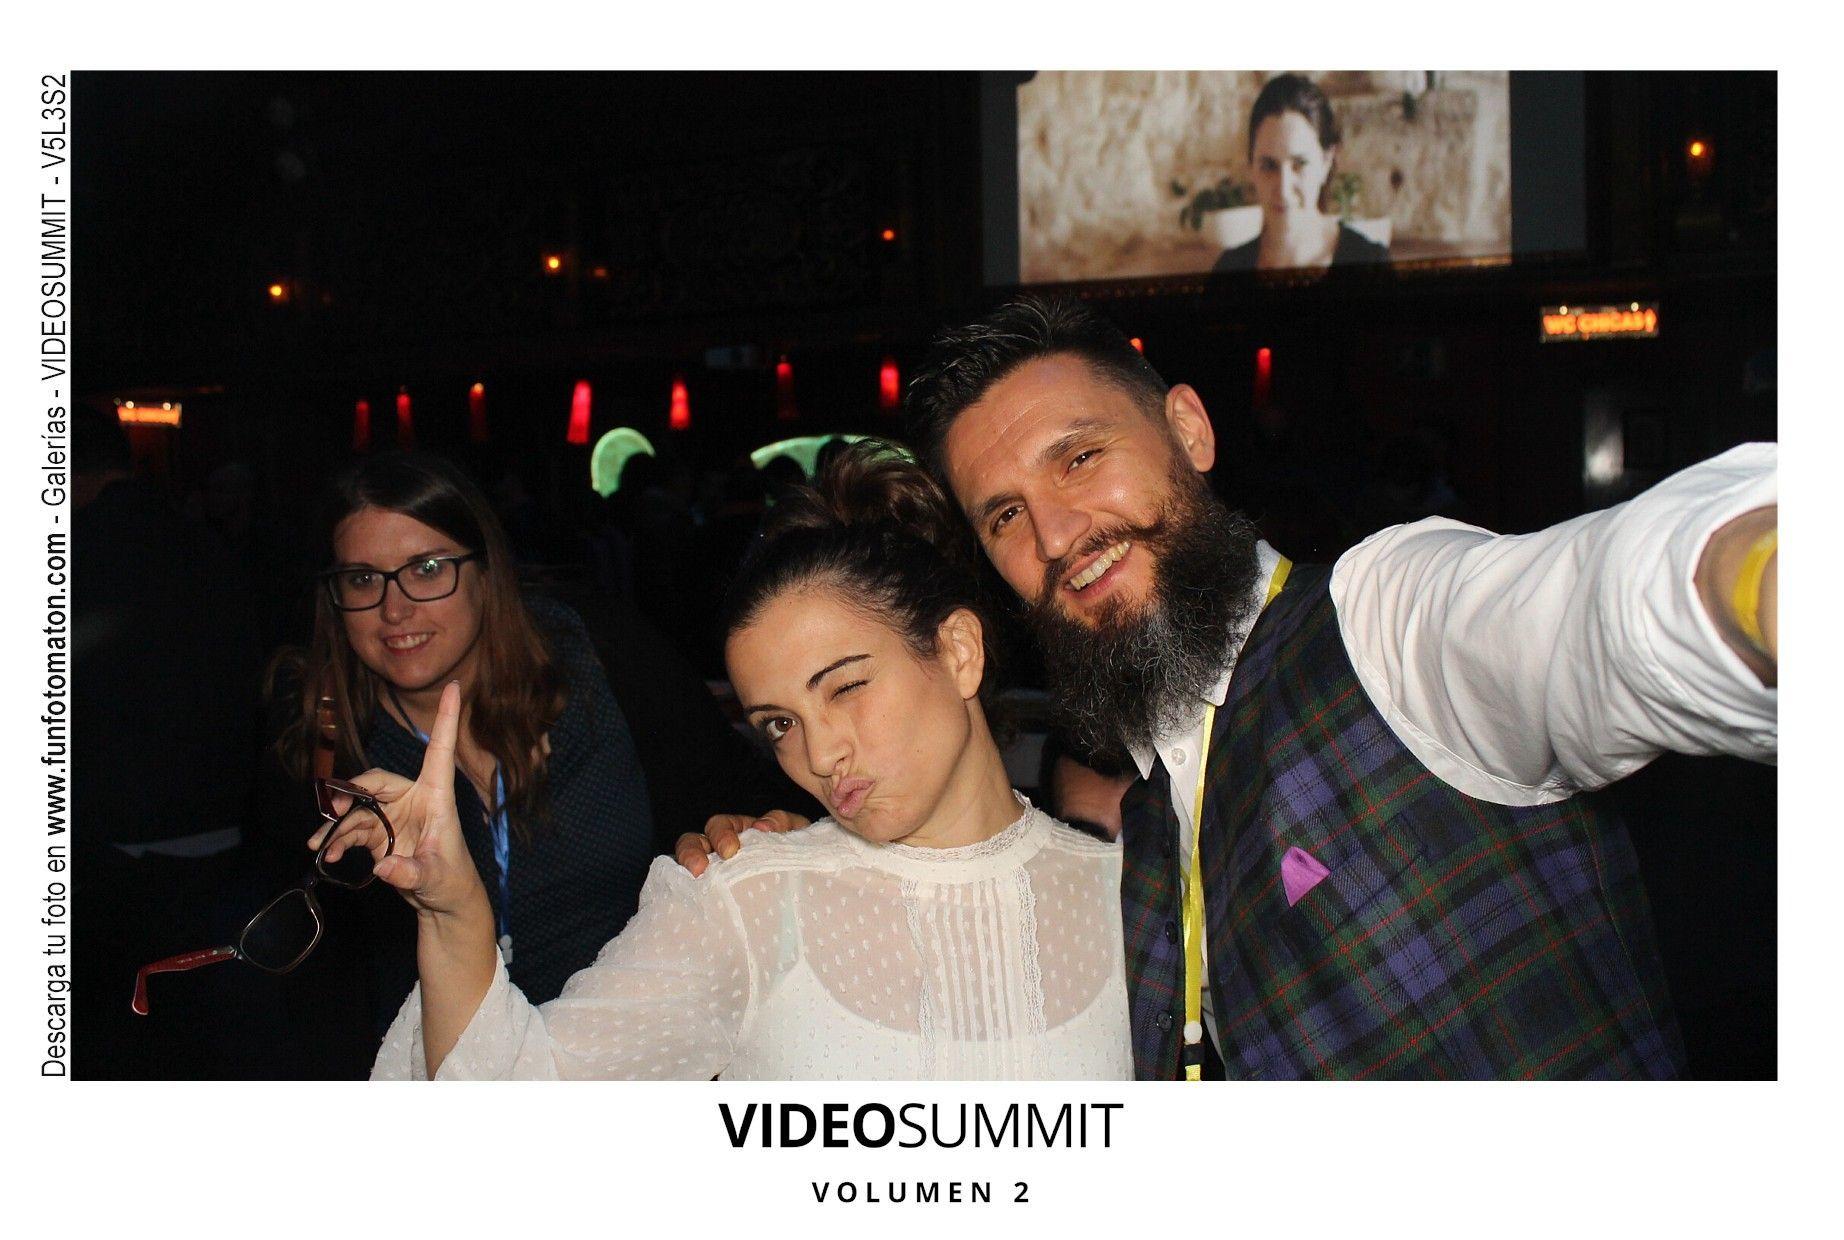 videosummit-vol2-club-party-030